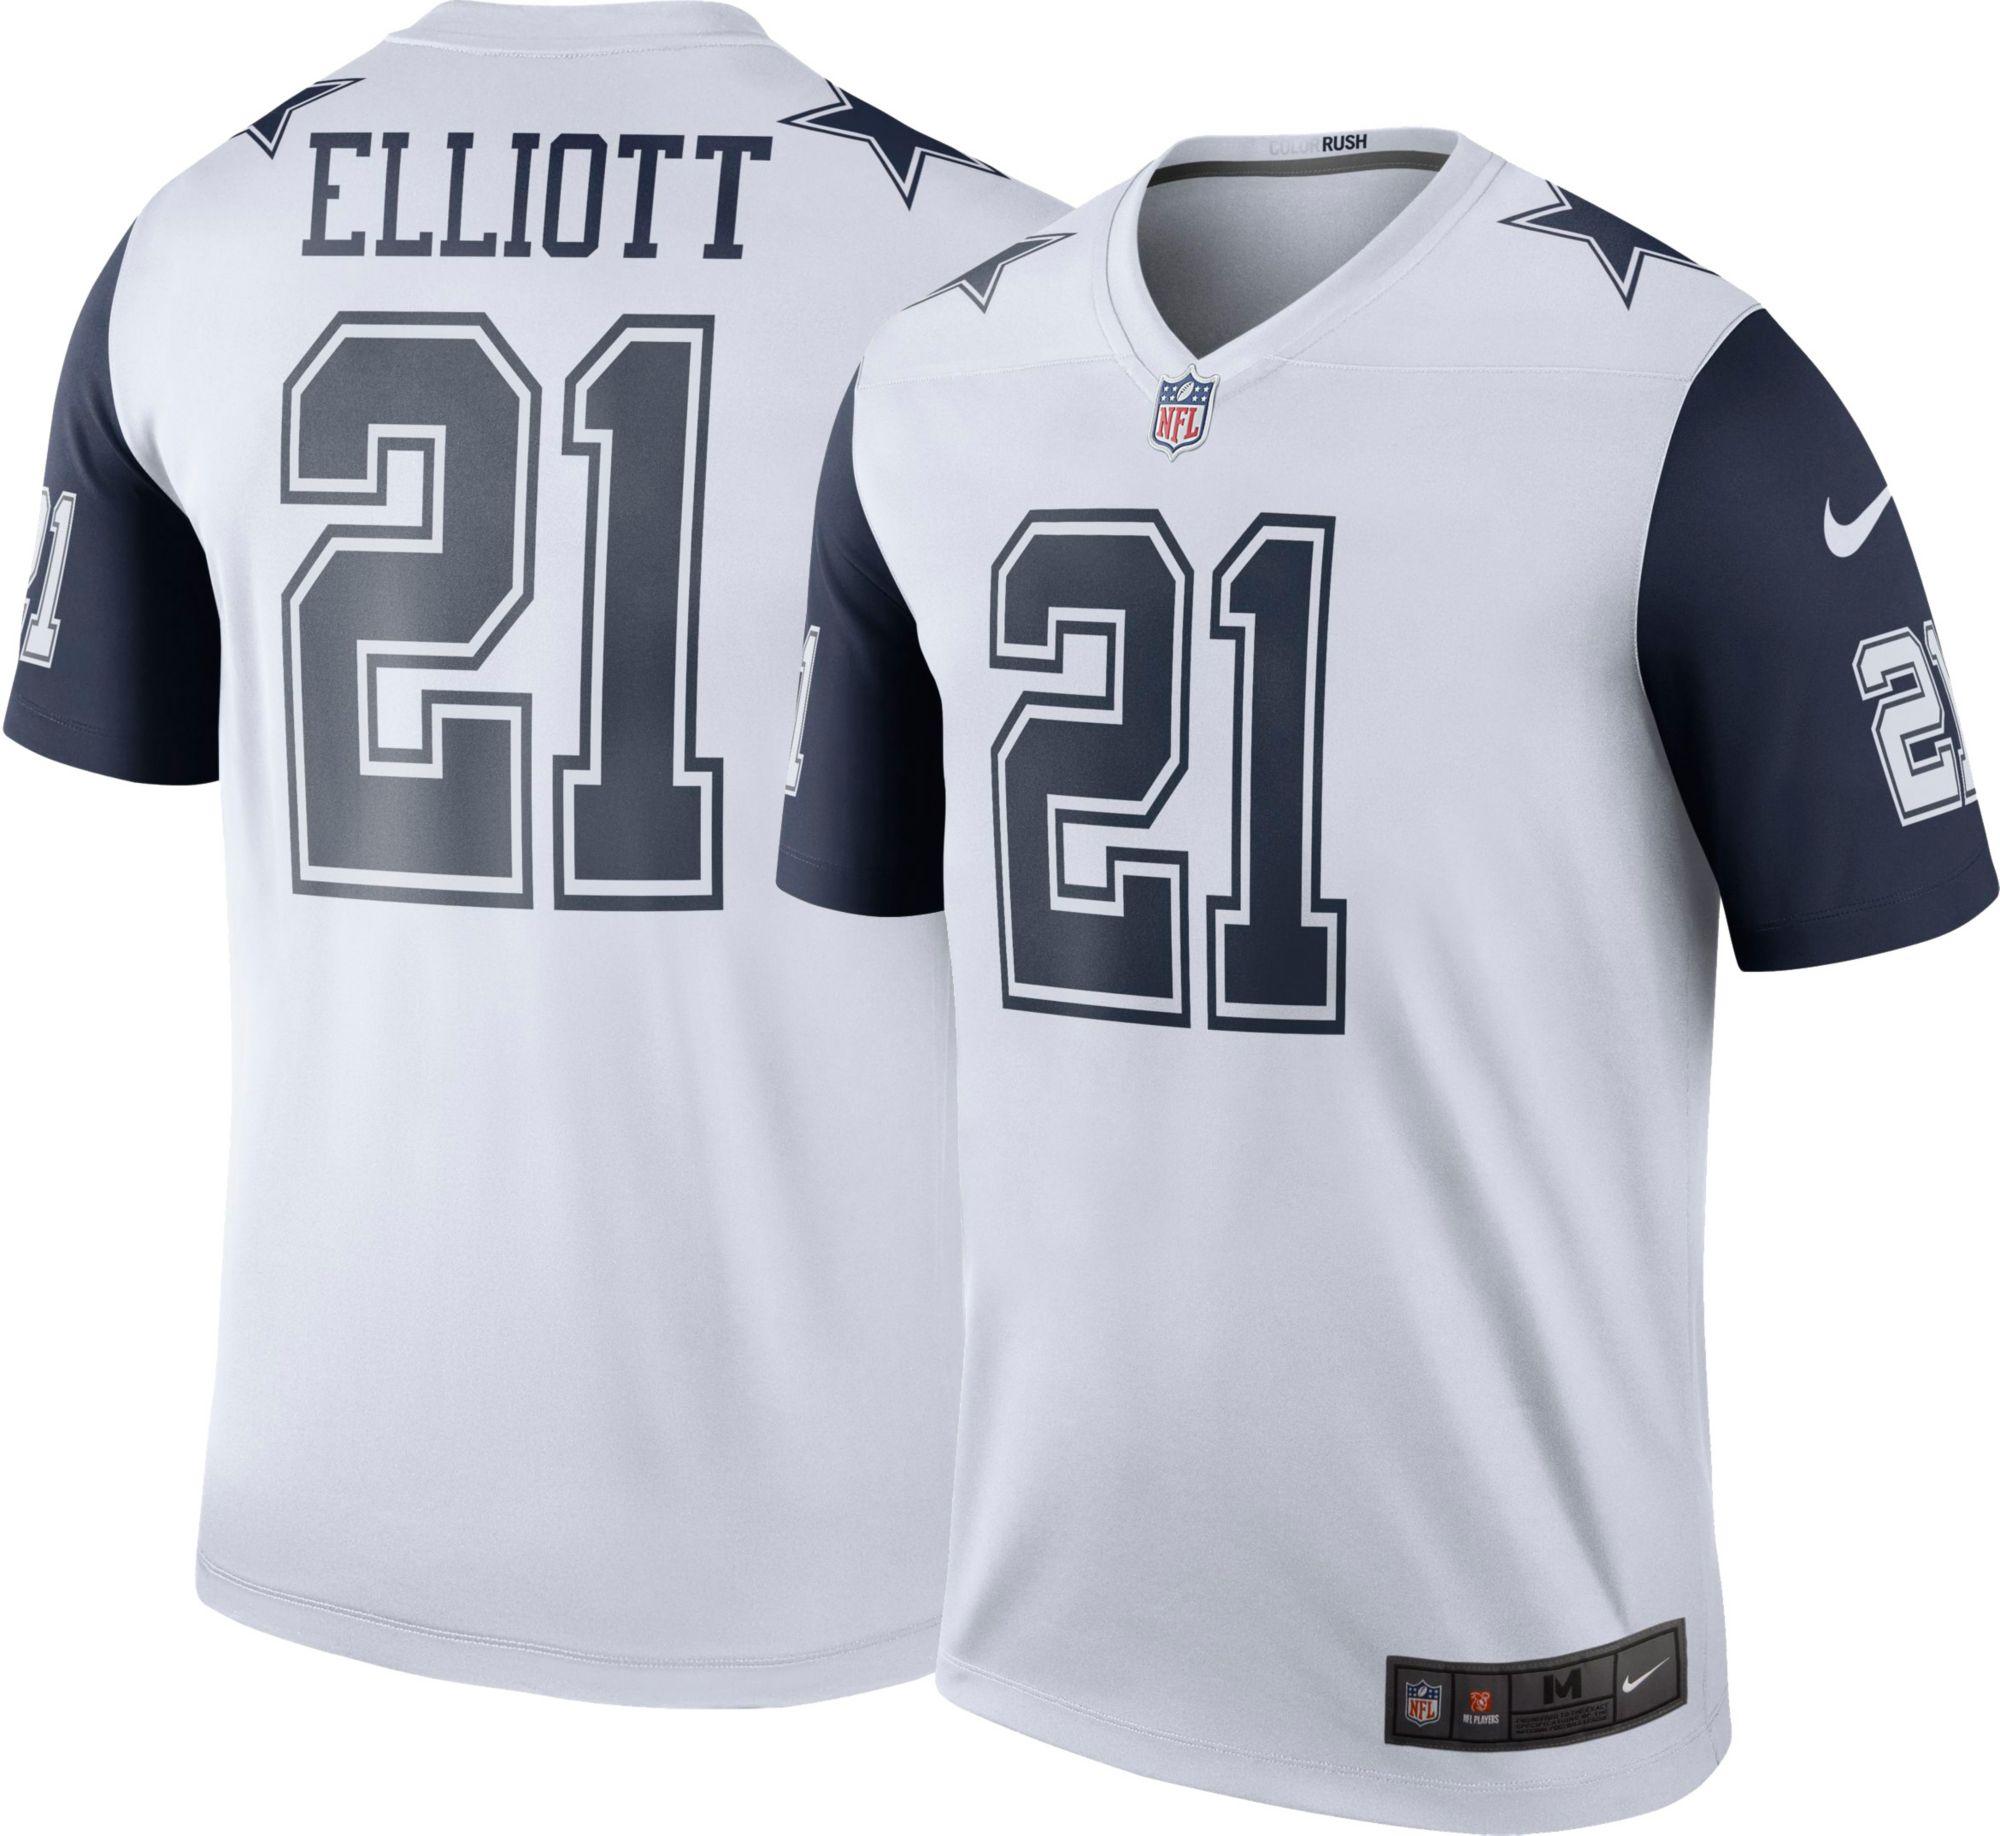 21 jersey